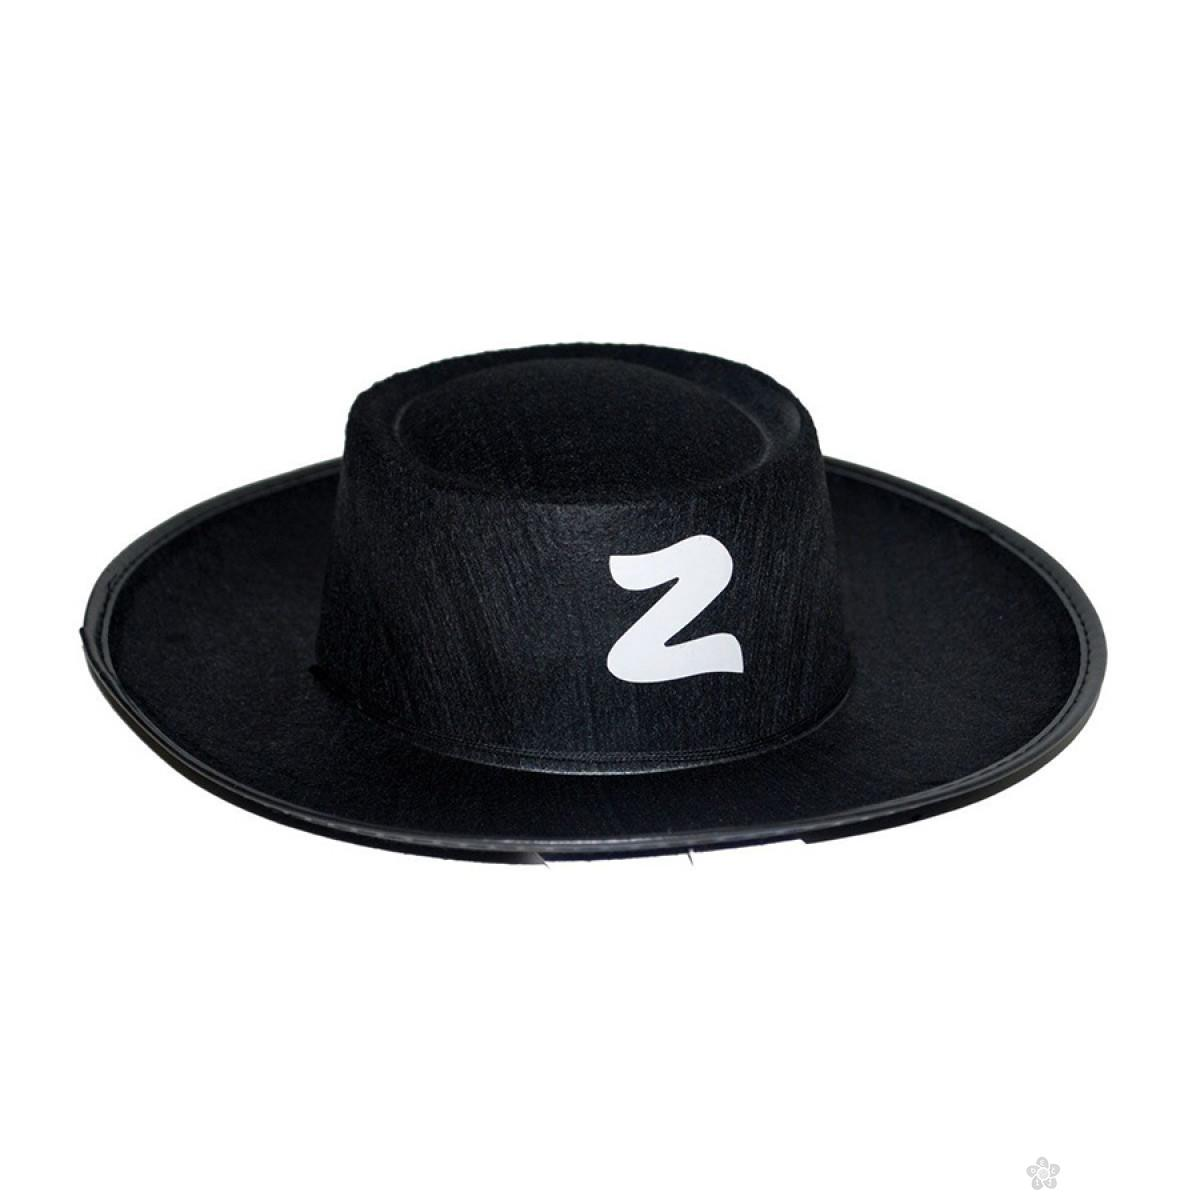 Kostim kapa Zoro